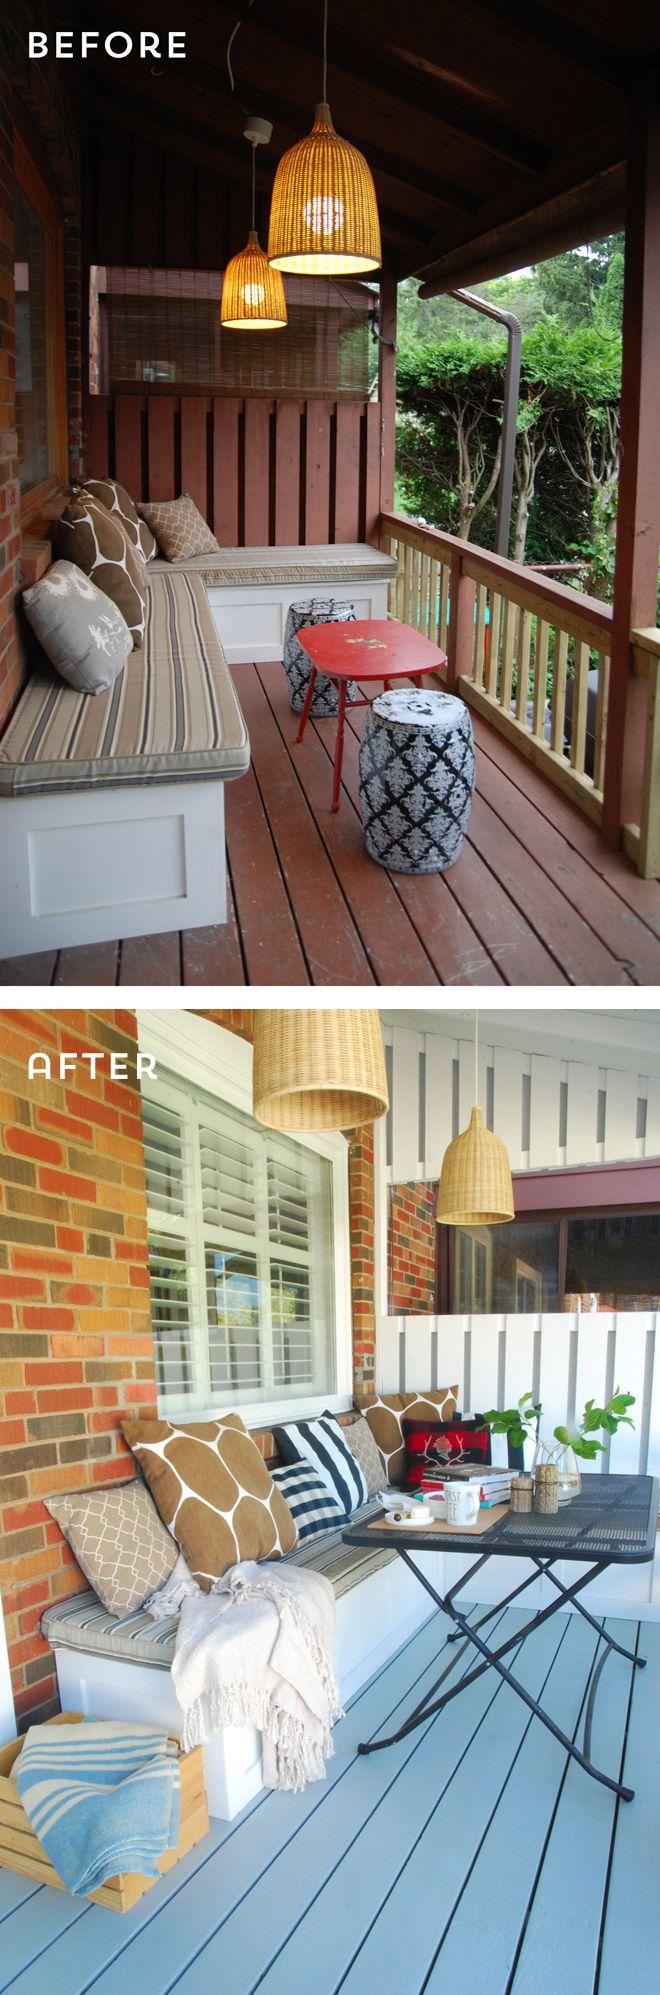 Rambling Renovators | Back porch makeover #beforeandafter